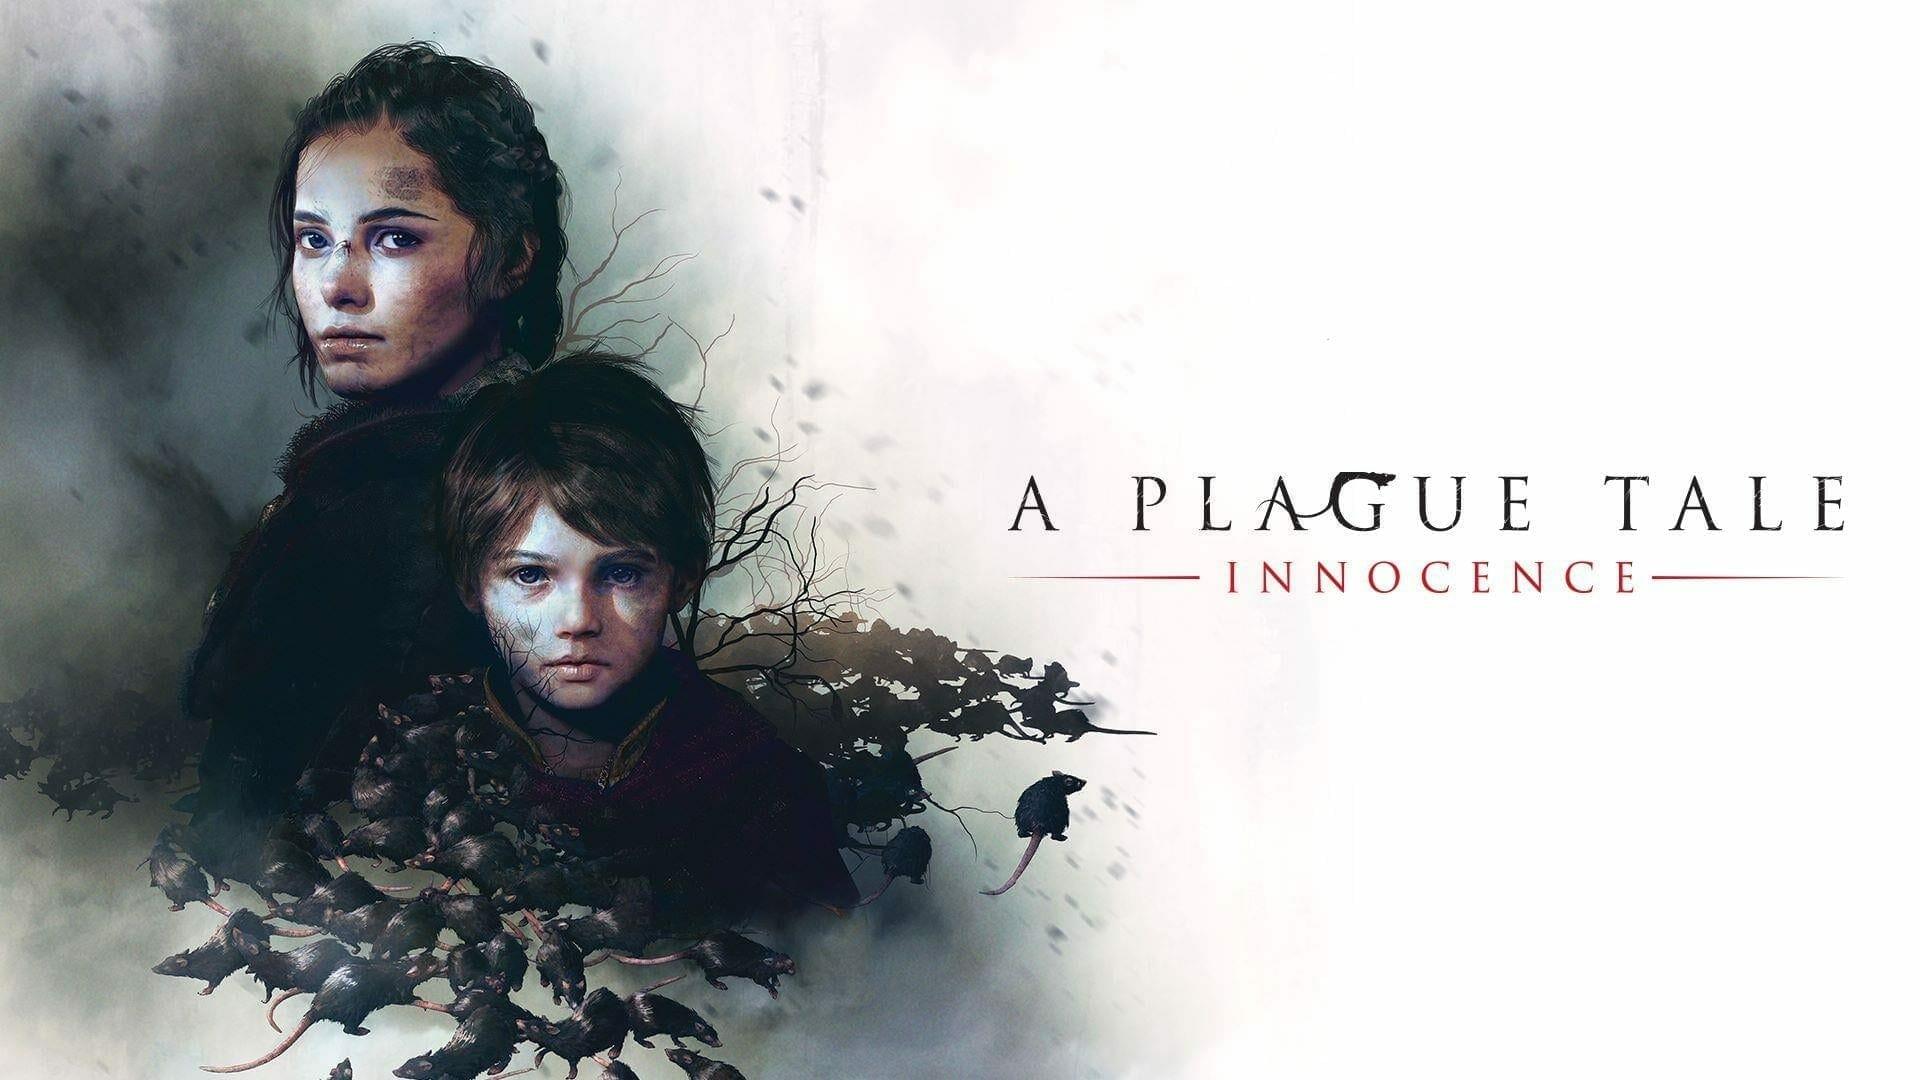 Plague Tale: Innocence High CPU